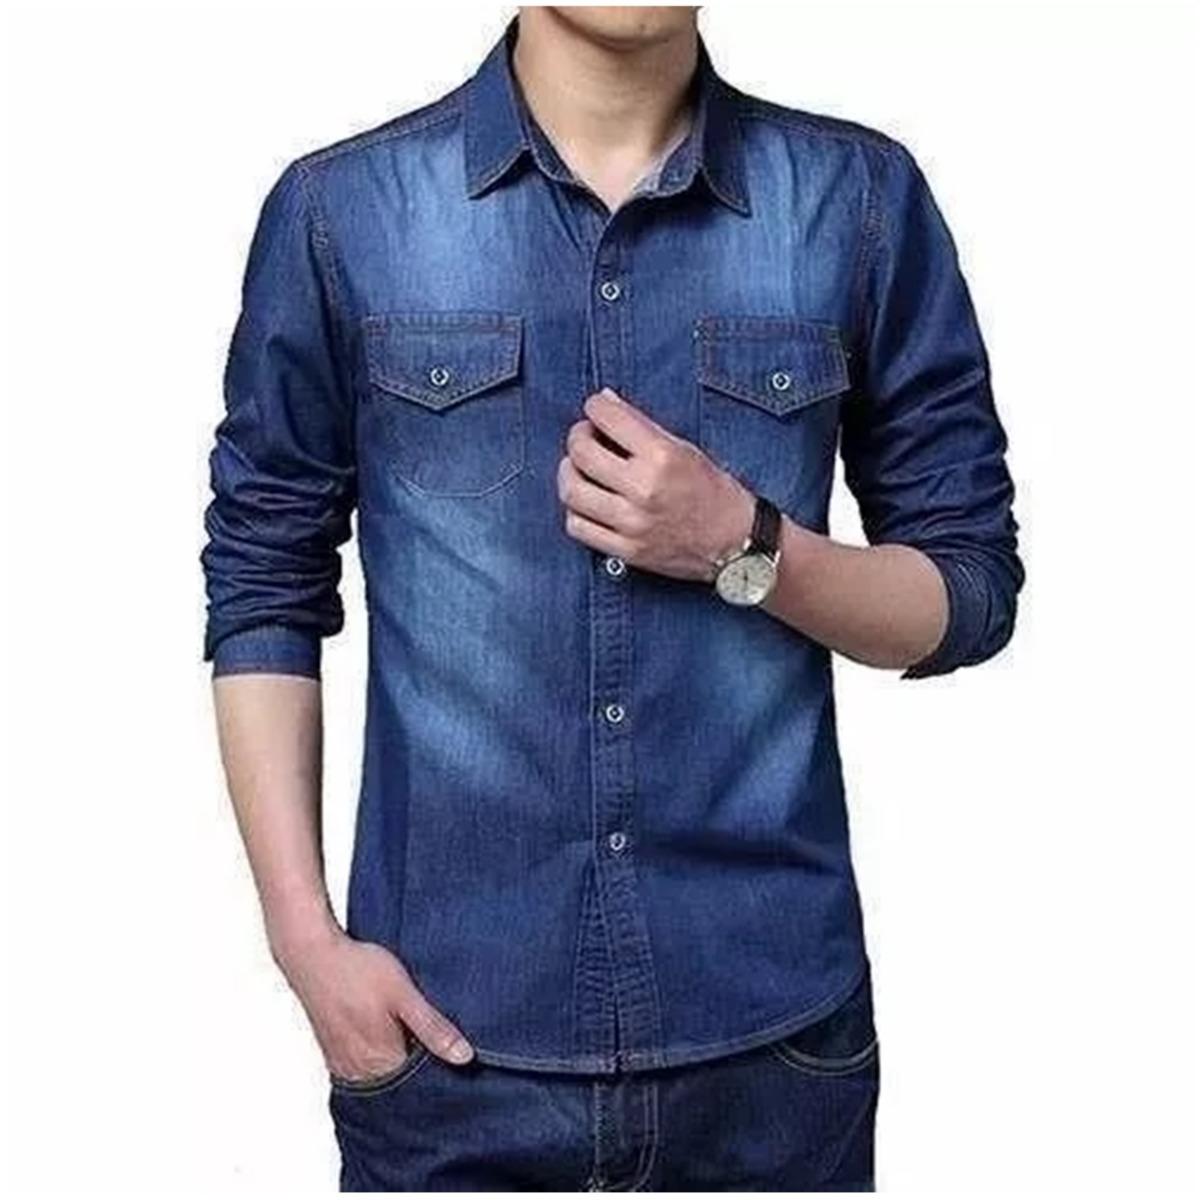 c27ec2ea11 camisa blusa jeans masculina leve inverno kit 2 peças oferta. Carregando  zoom.